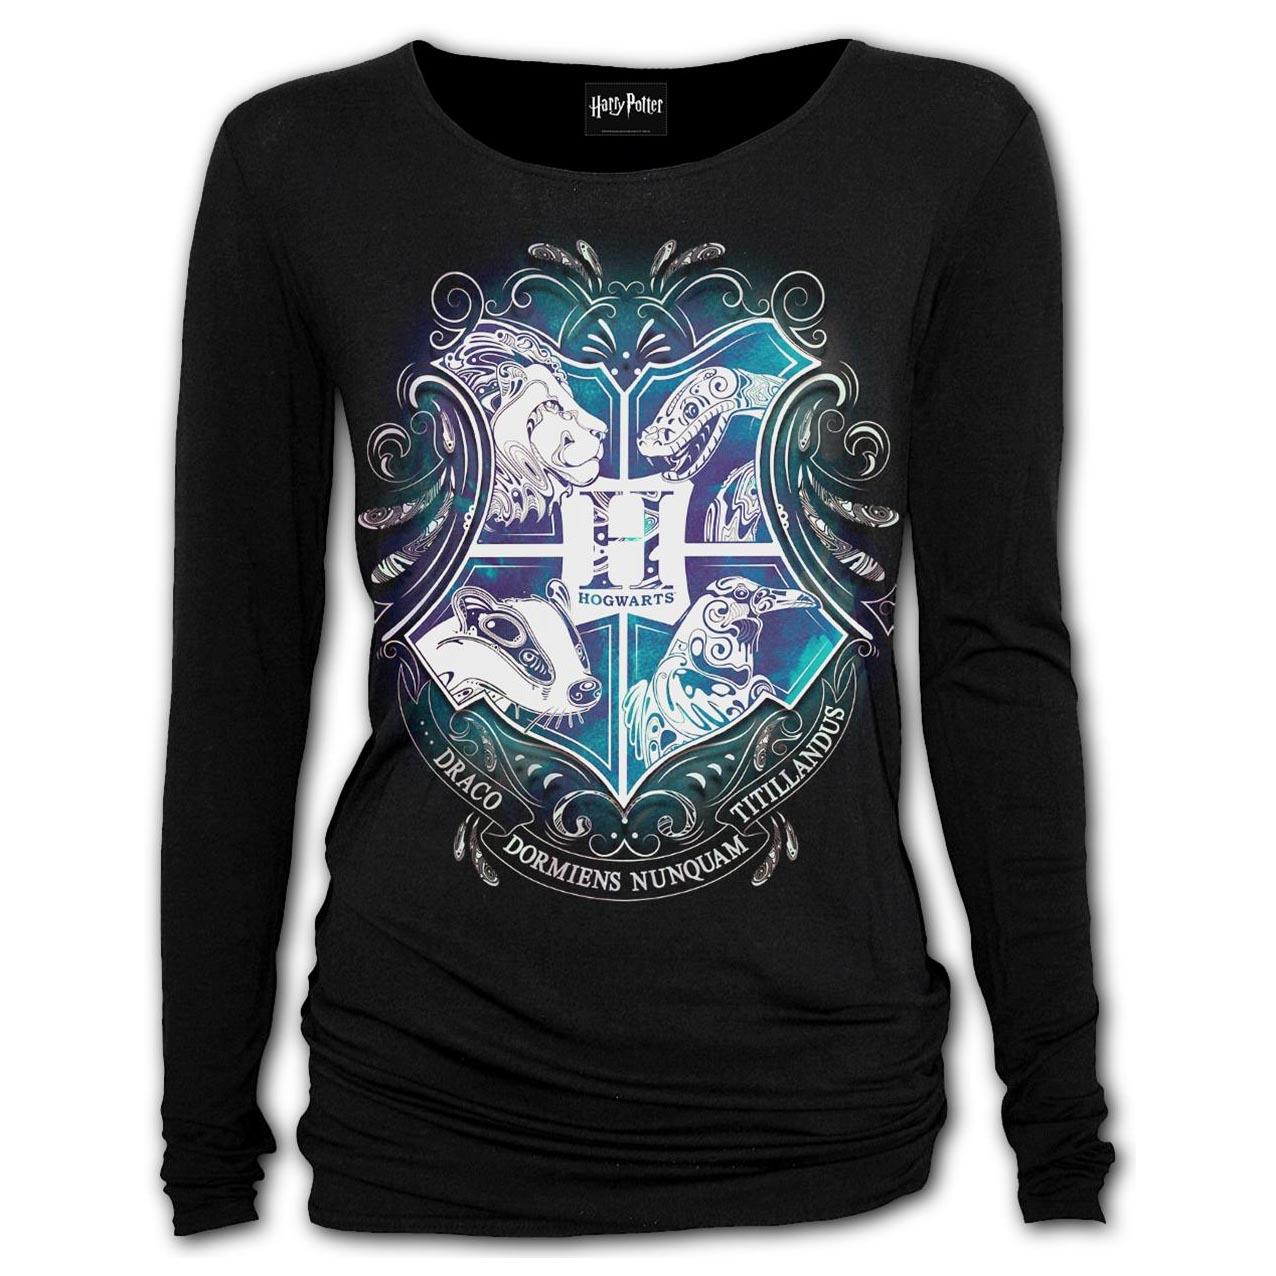 Spiral-Ladies-Black-Harry-Potter-HOGWARTS-Crest-L-Sleeve-Top-All-Sizes thumbnail 7